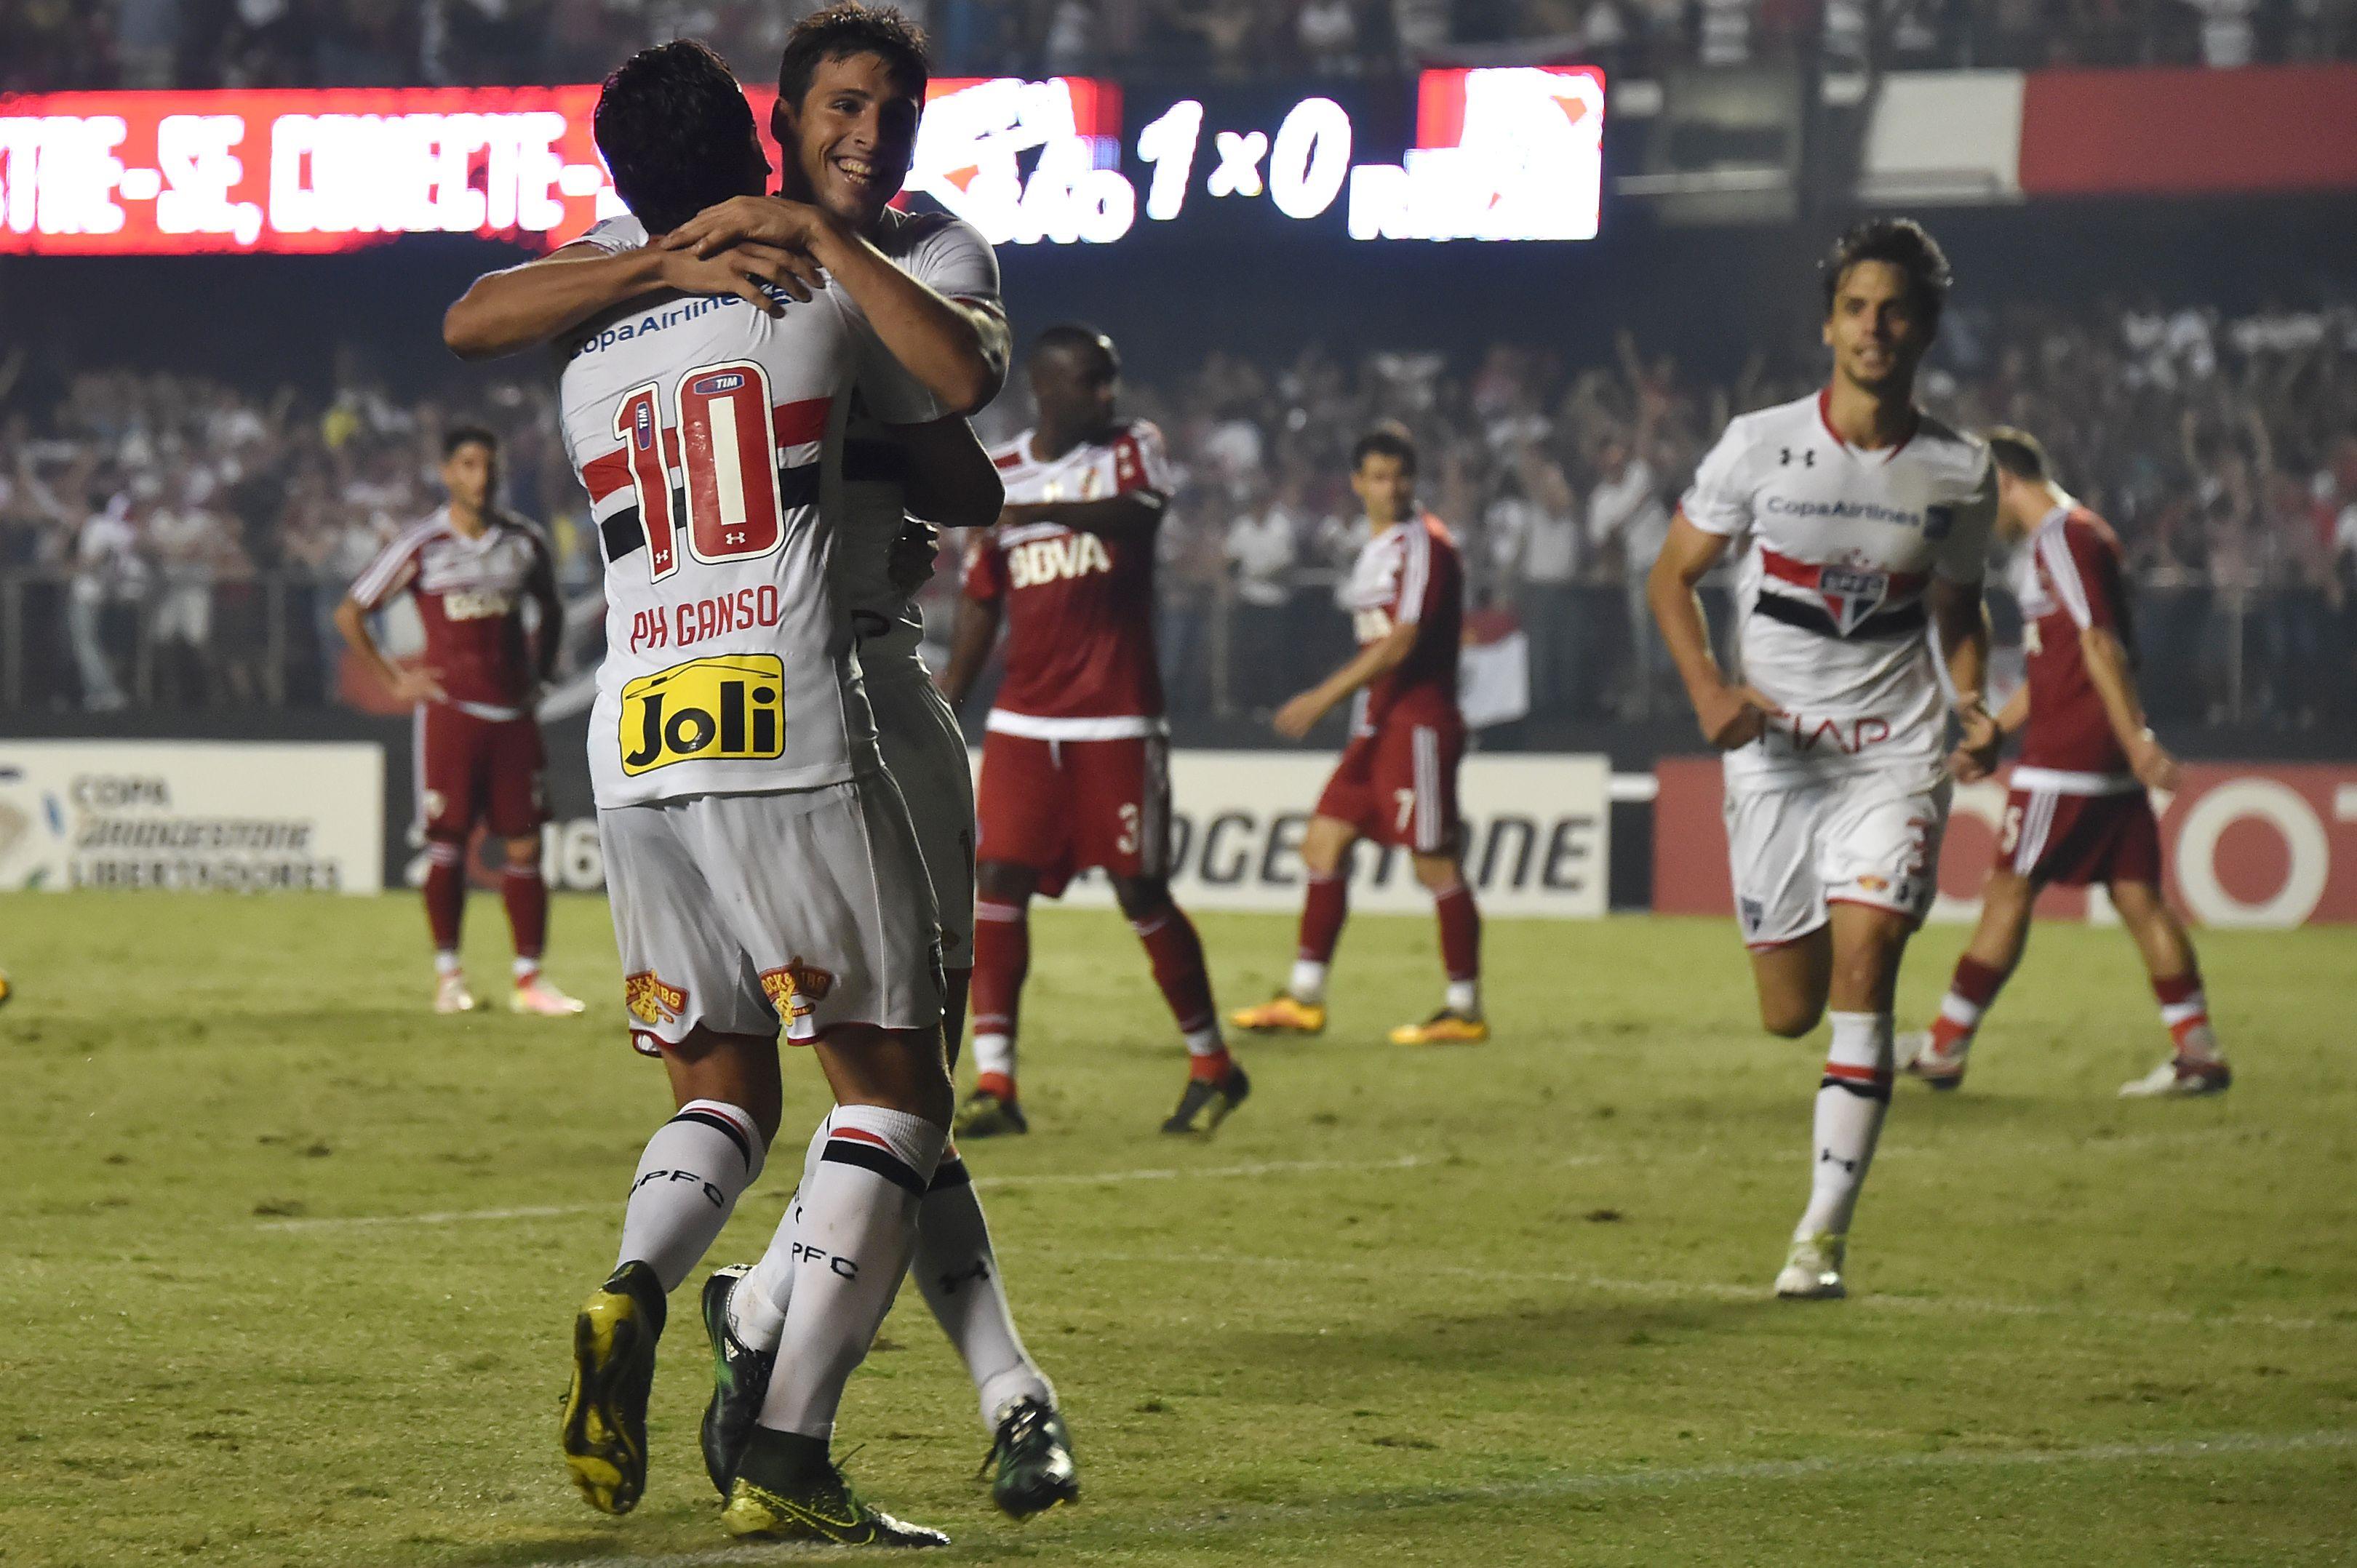 River Plate perdió 2-1 ante Sao Paulo por Copa Libertadores | Depor.com